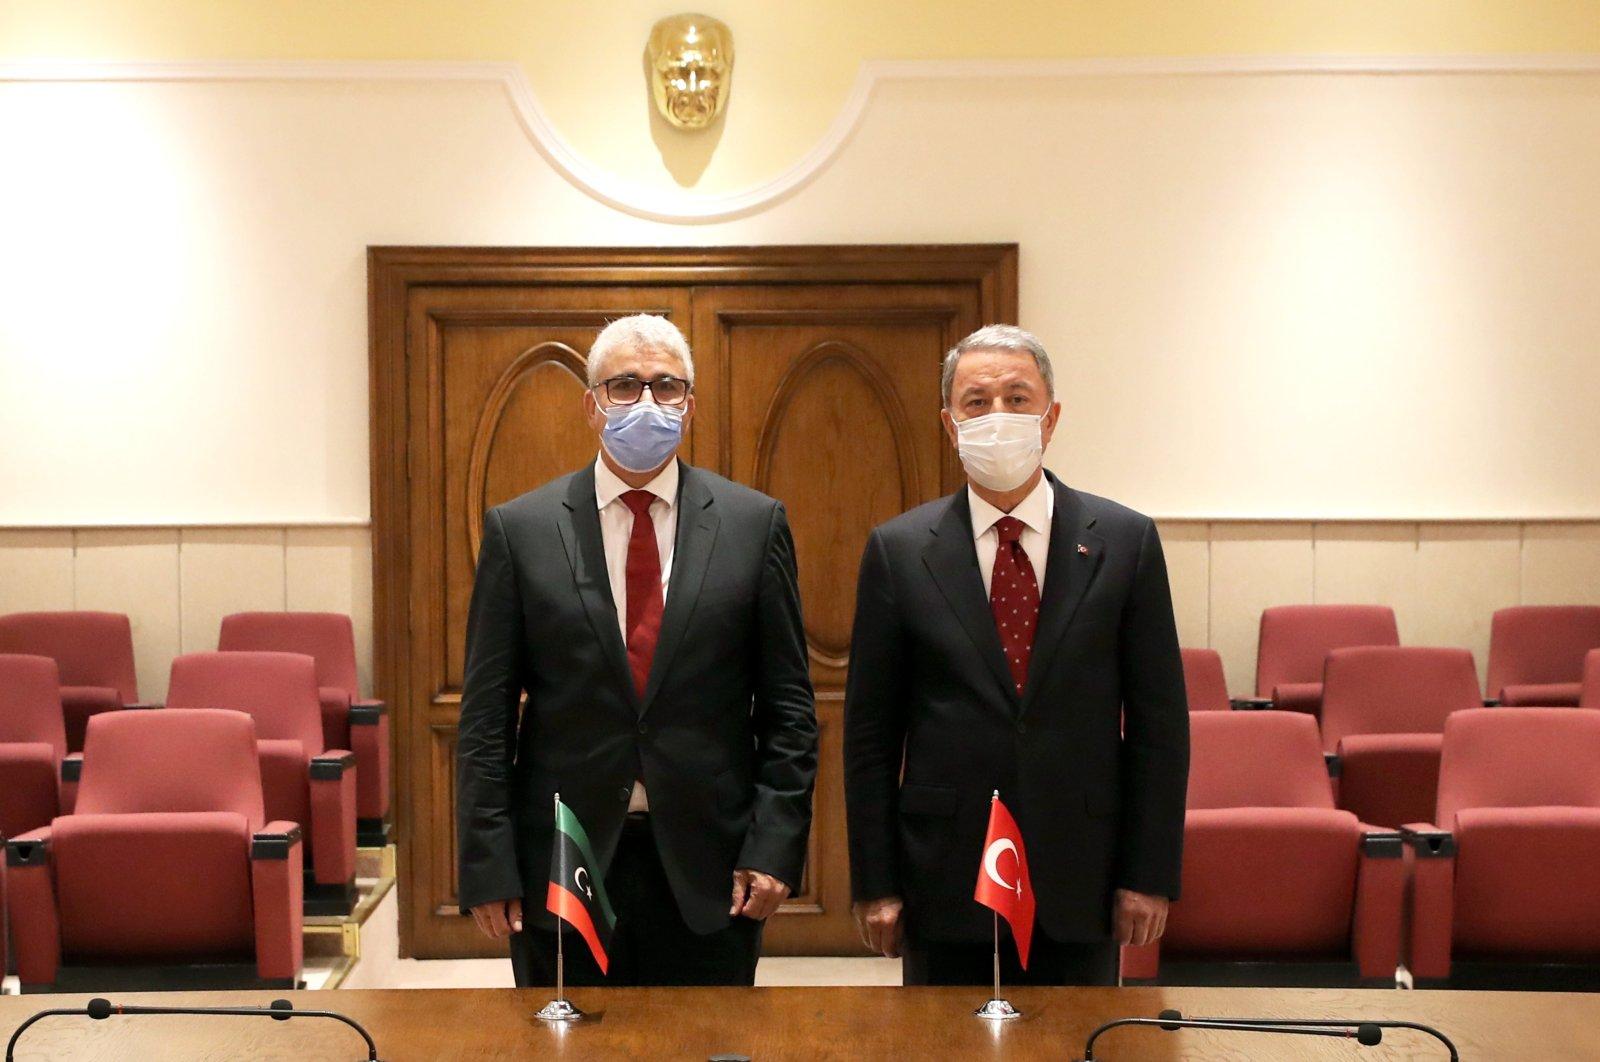 Defense Minister Hulusi Akar (R) receives Libya's Interior Minister Fathi Bashagha in the capital Ankara, Turkey, Aug. 28, 2020. (AA Photo)